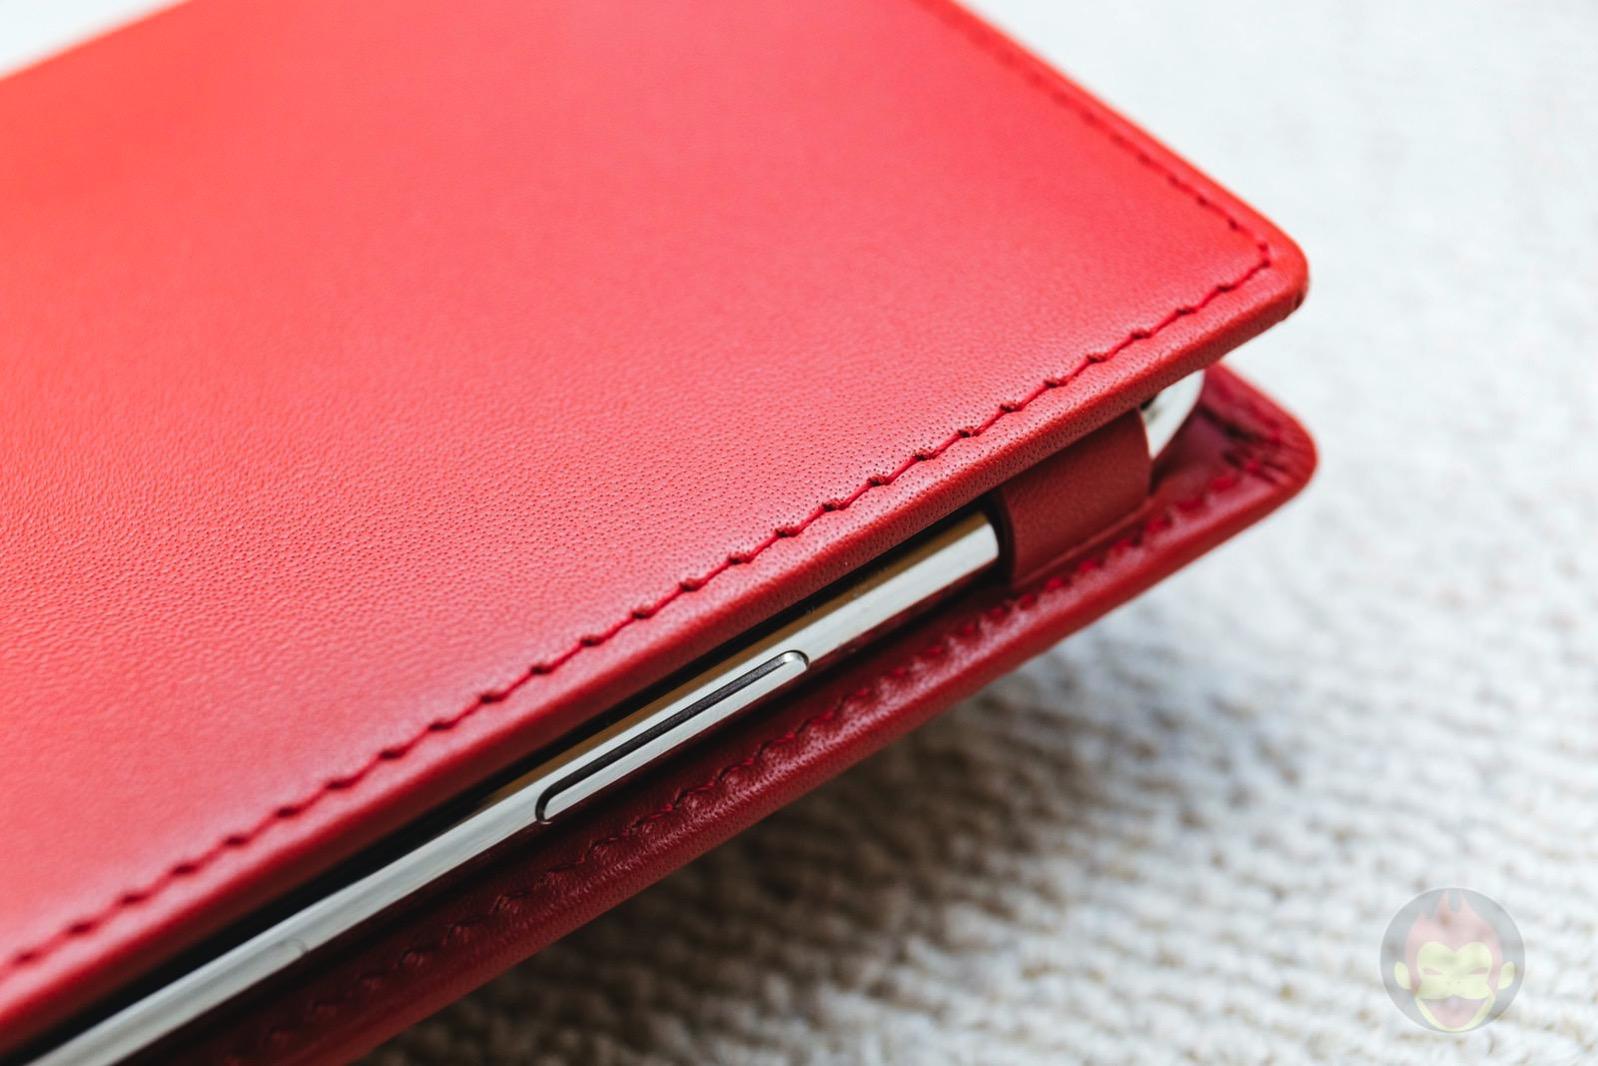 GRAMAS-Full-Leather-Case-Red-for-iPhoneX-SIM-PIN-04.jpg